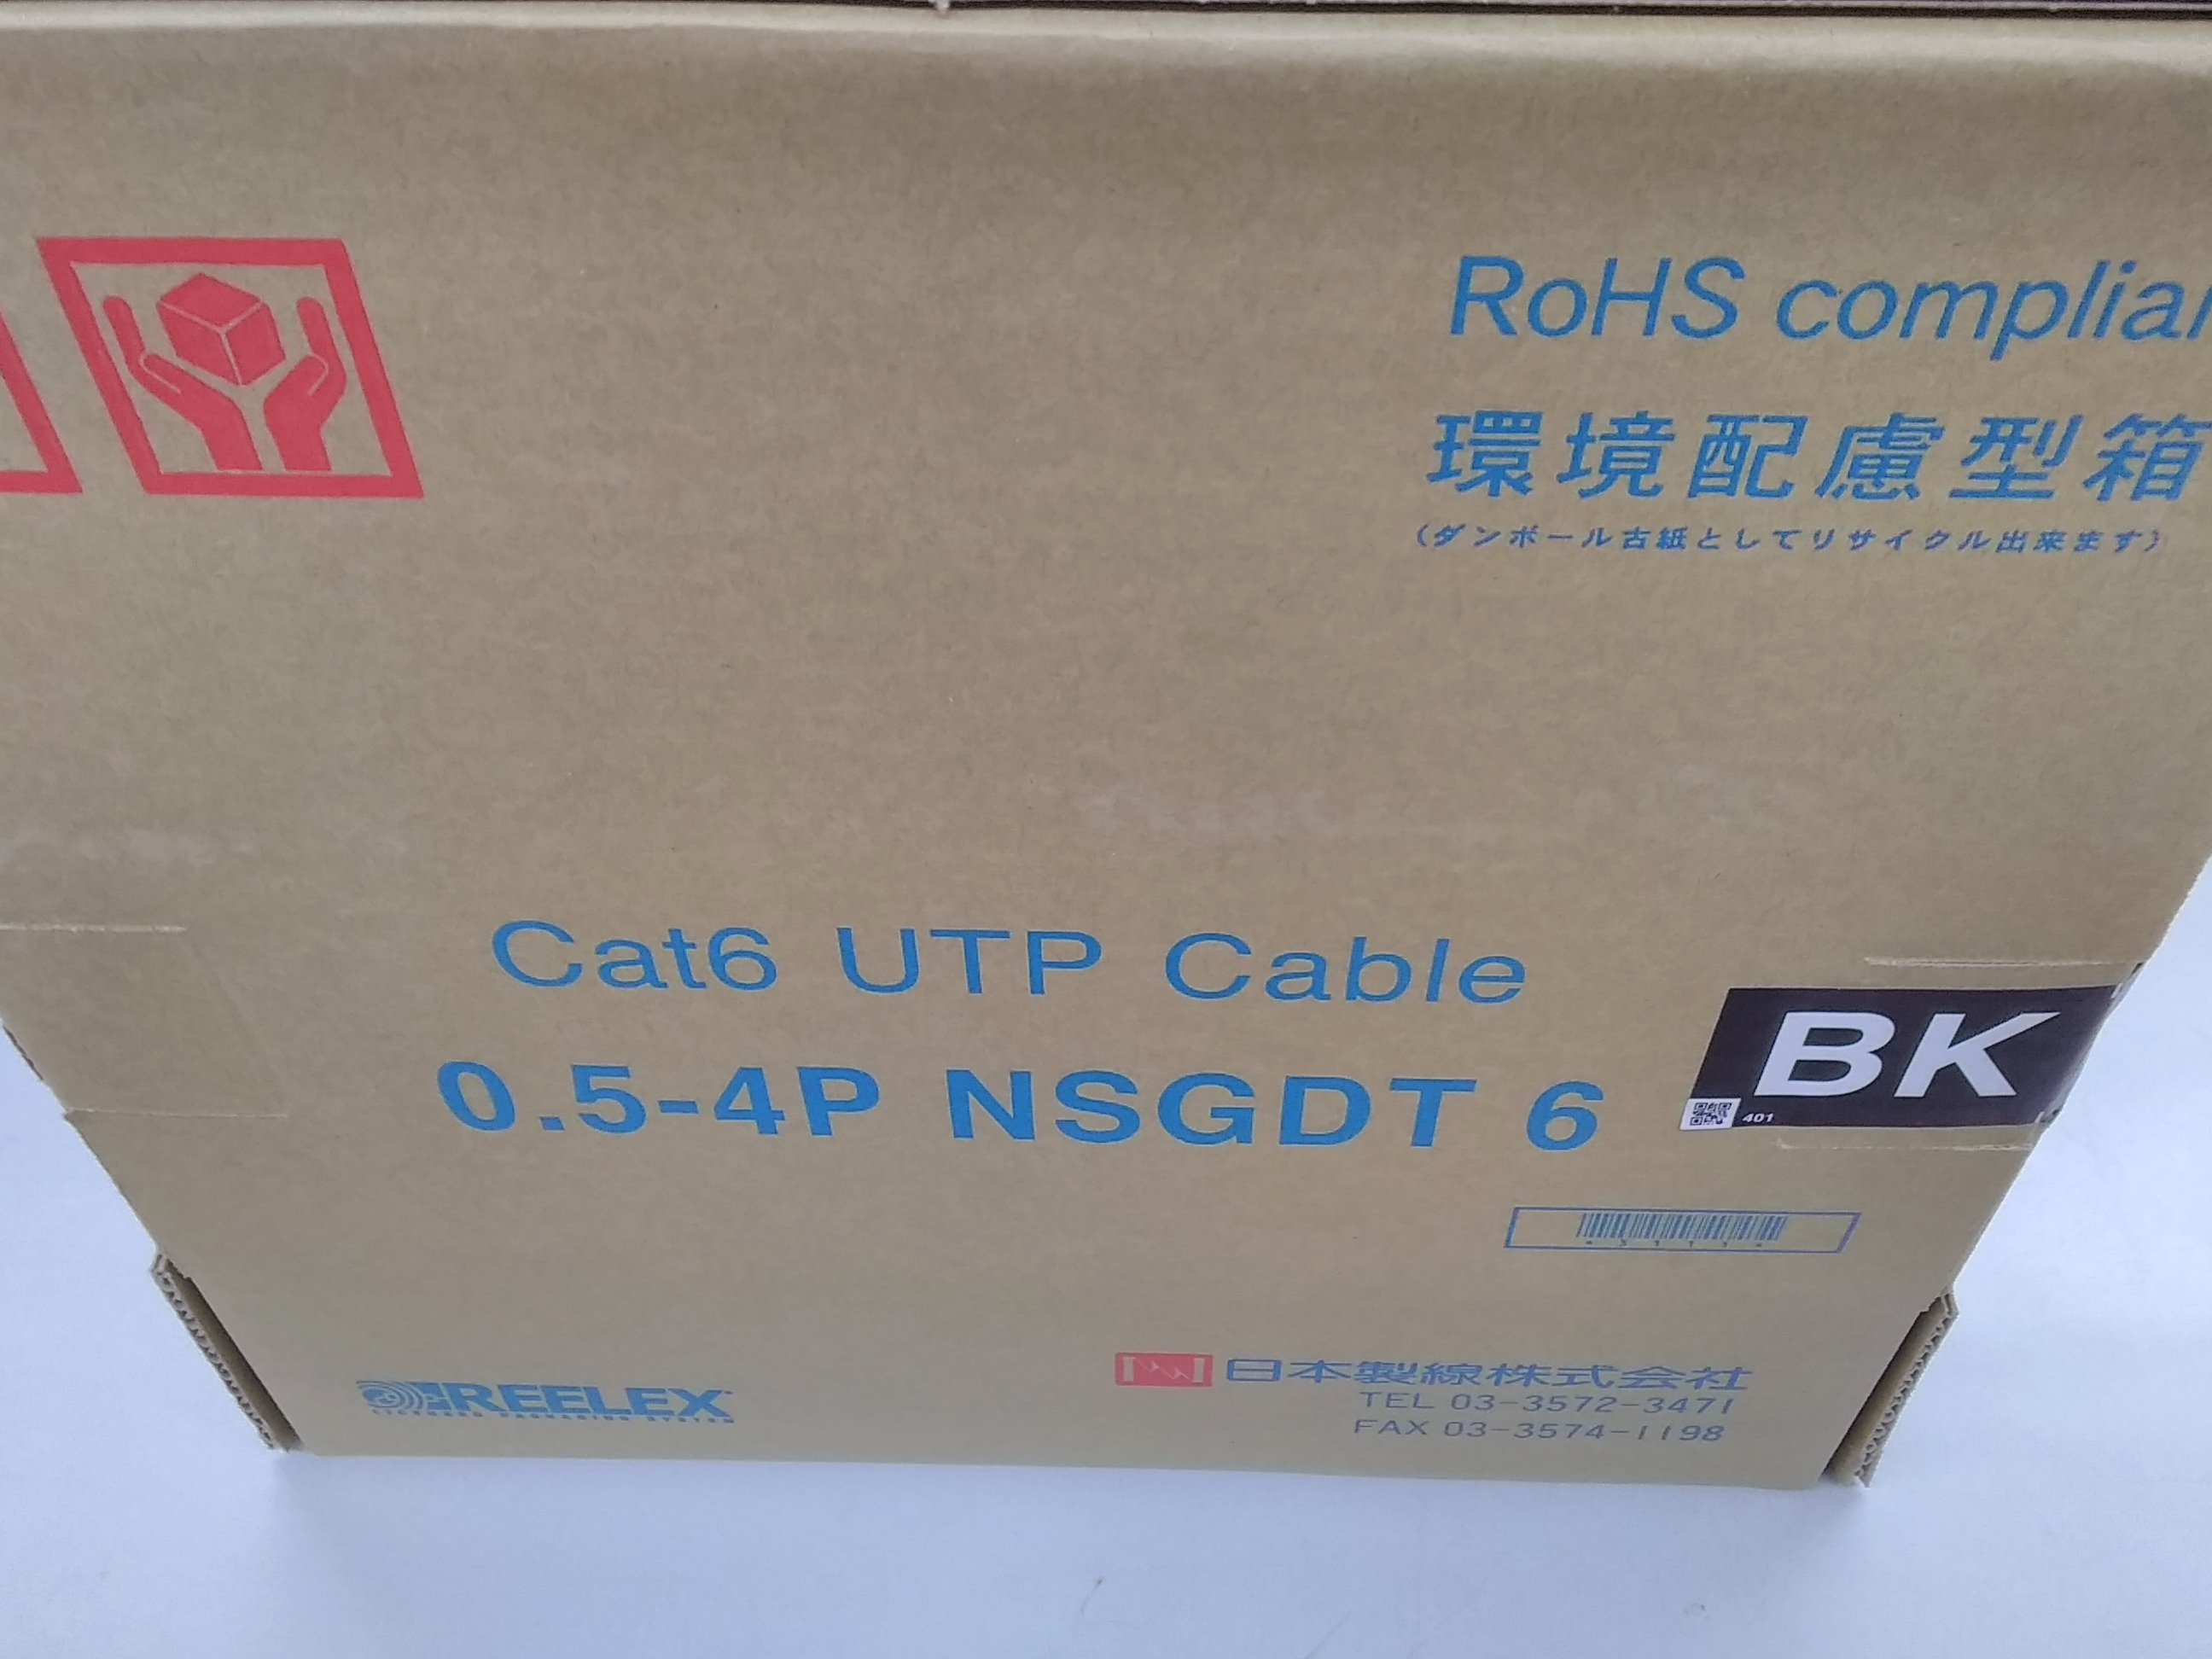 CAT6 UTP CABLE|日本製線